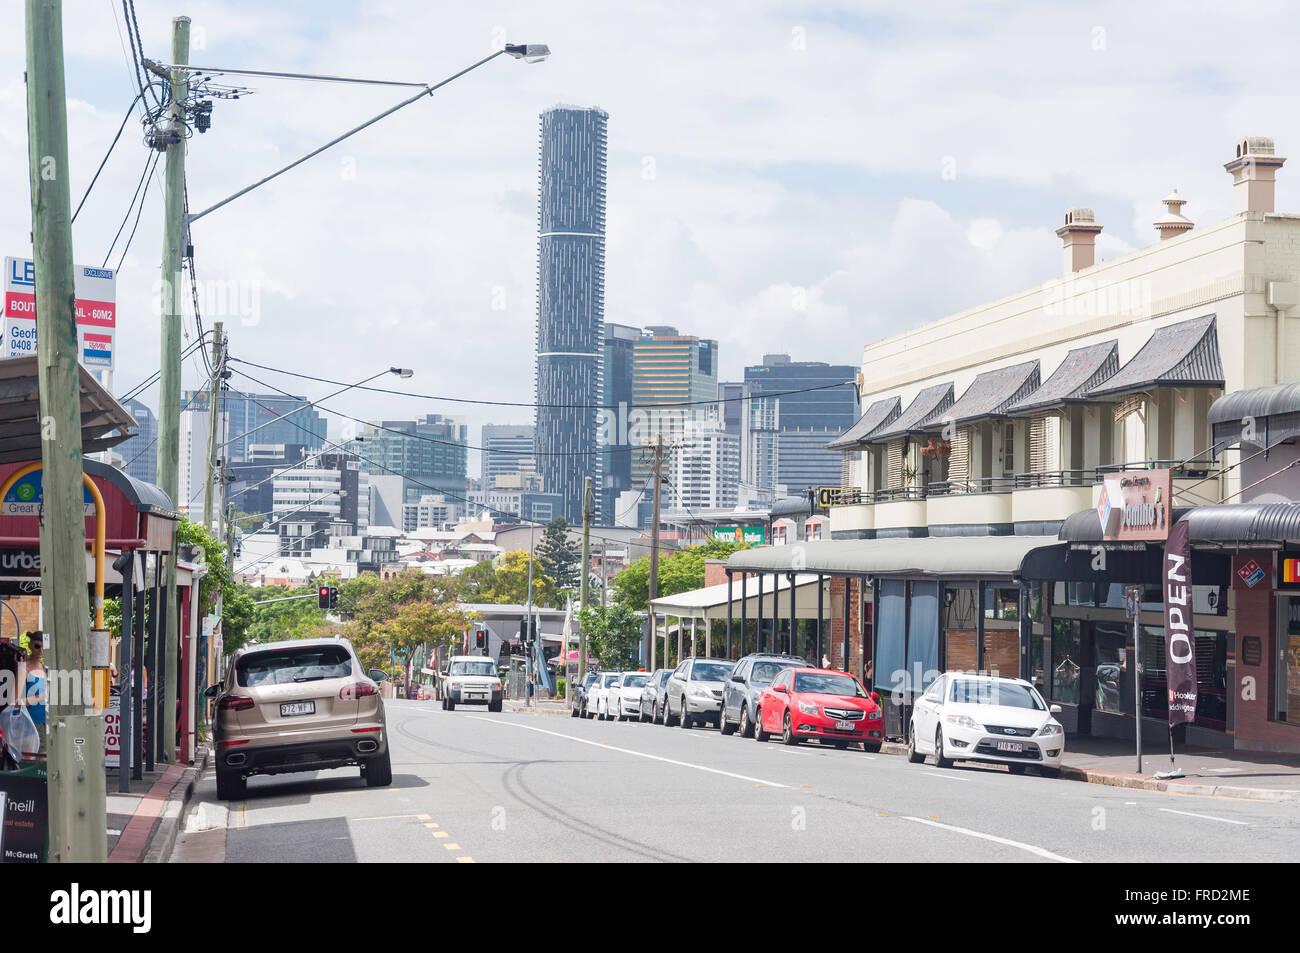 Downtown CBD from Given Terrace, Paddington, Brisbane, Queensland, Australia - Stock Image